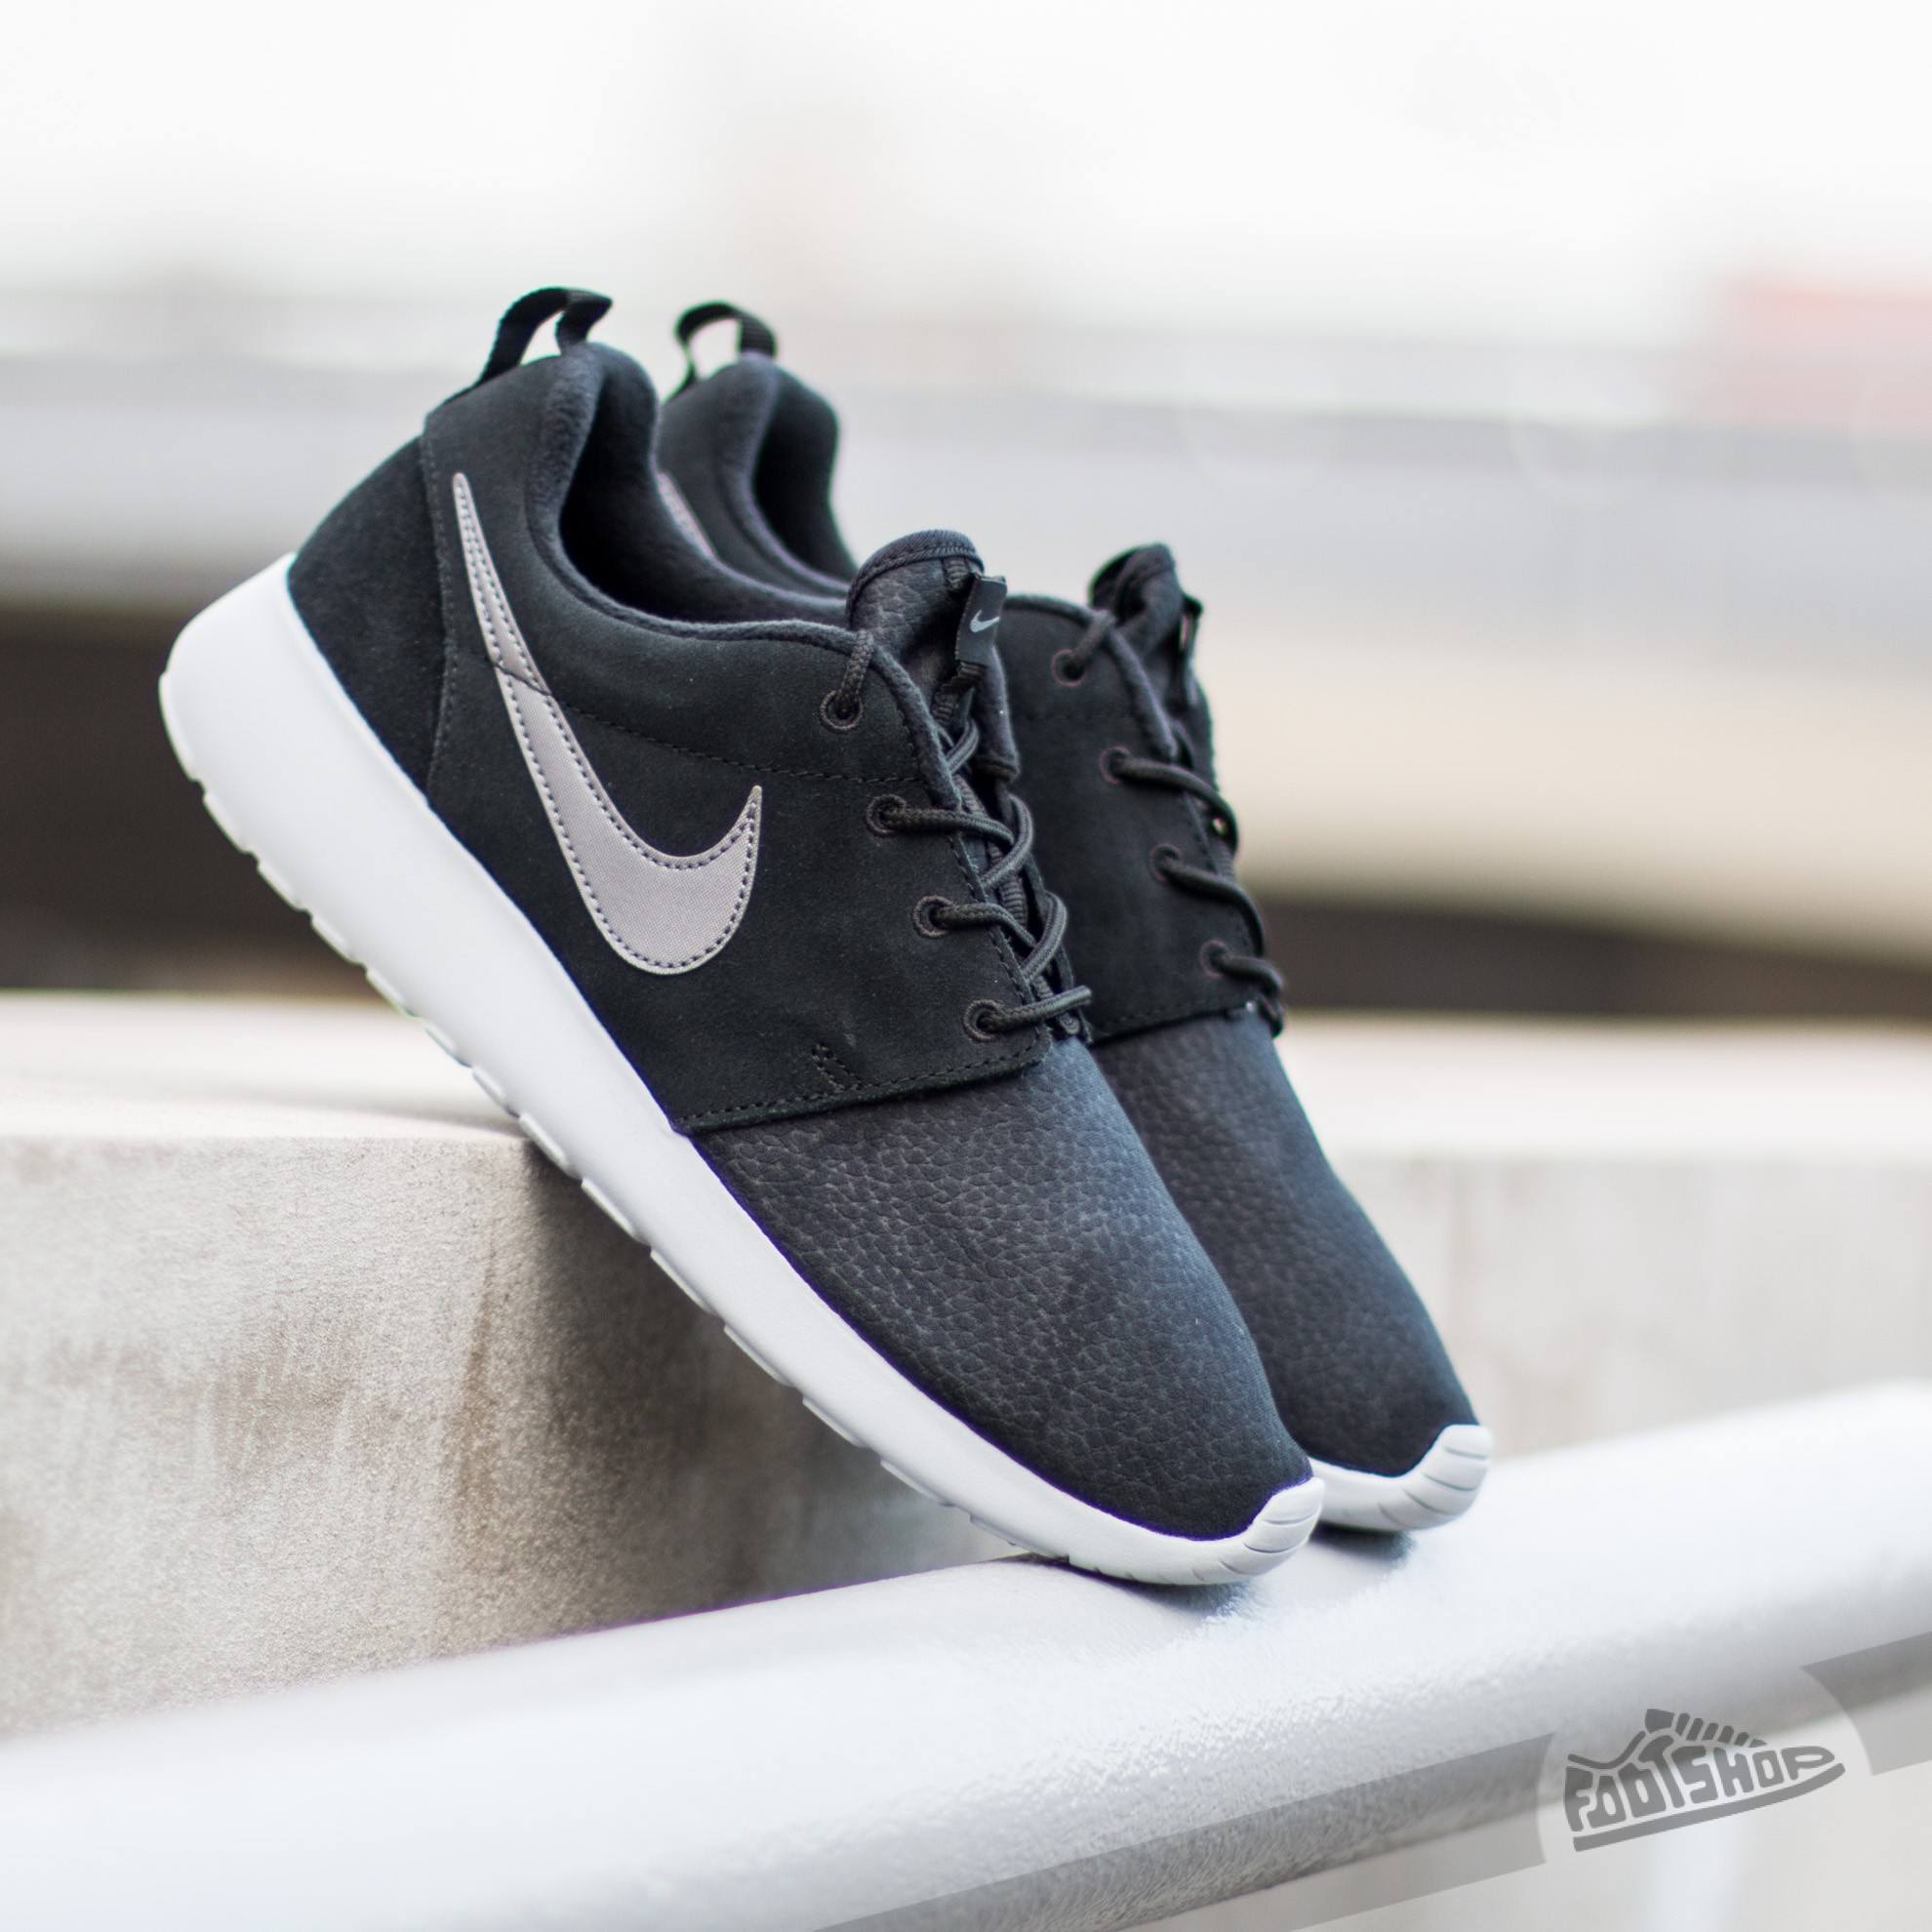 626228752bd1 Nike Roshe One Suede Black  Metallic Dark Grey- Wolf Grey